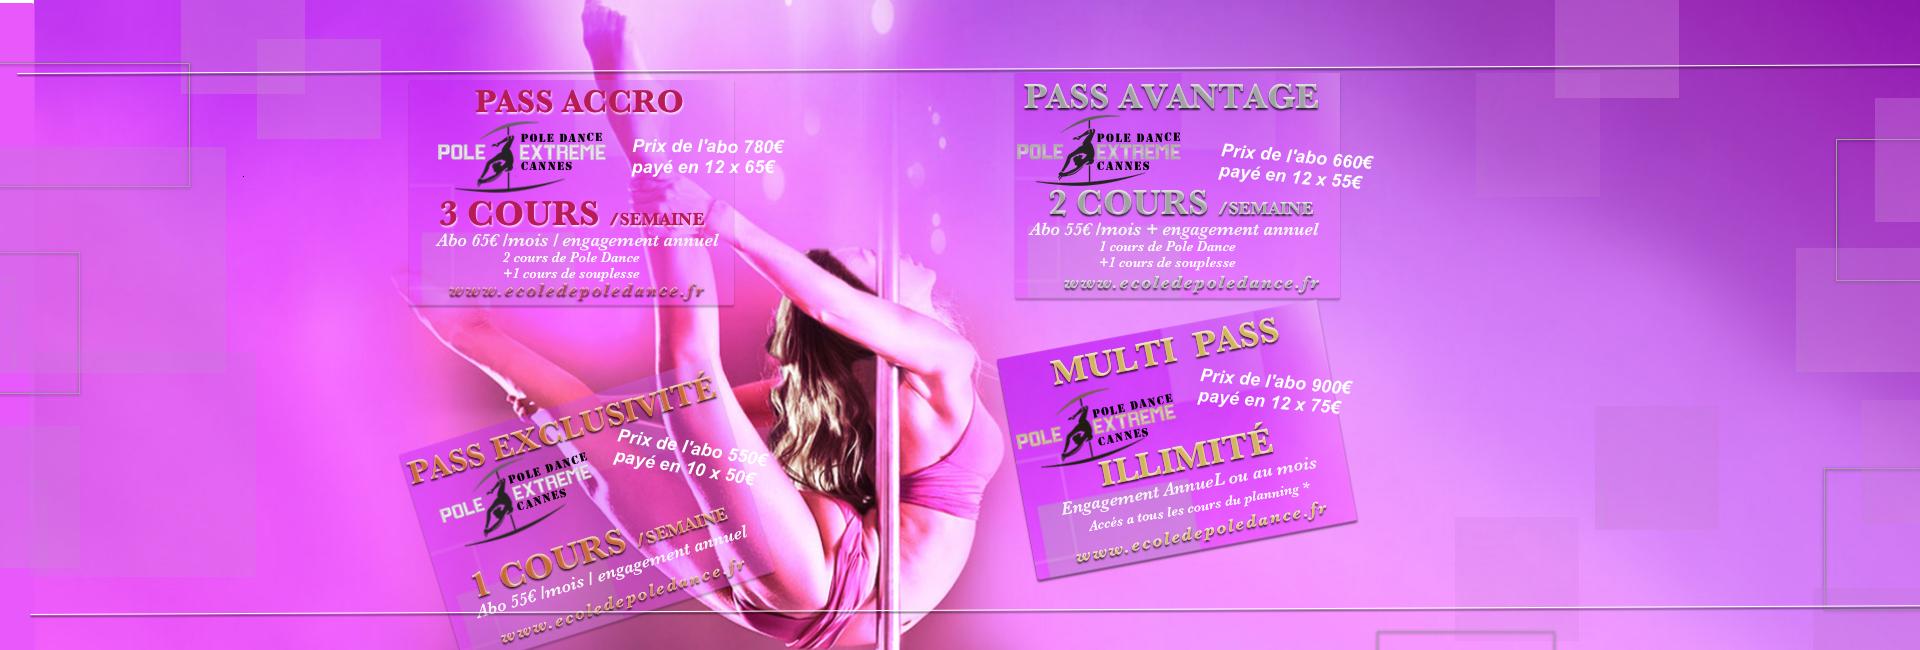 pole_dance_cannes-poledancestudiocannes-_sport-cannes-soupleese-tarif_pole-danse-cerceau-contorsion_